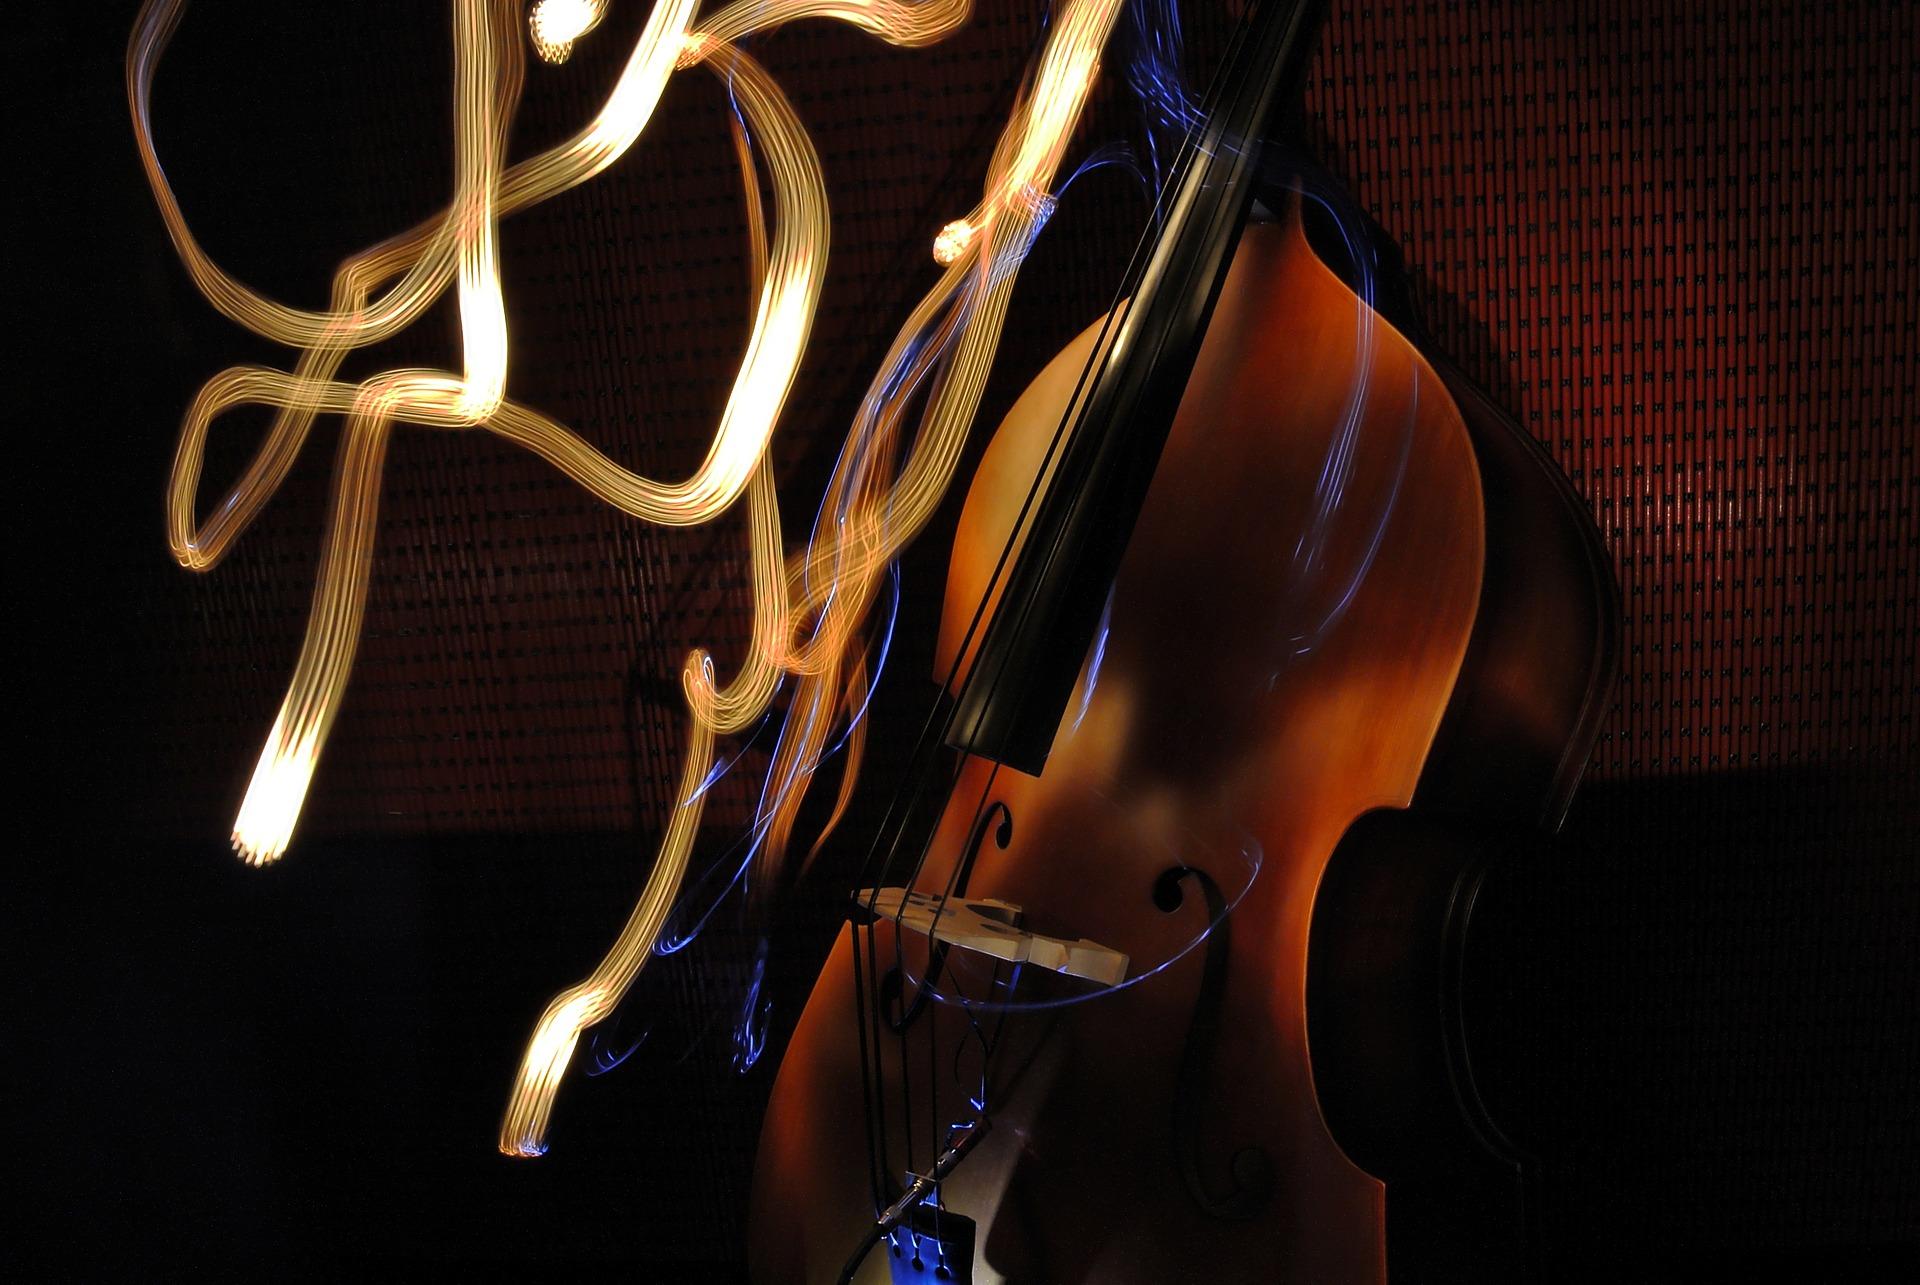 Dvojac Bow vs Plectrum na svečanoj večeri u Washingtonu kao simbol hrvatske glazbe